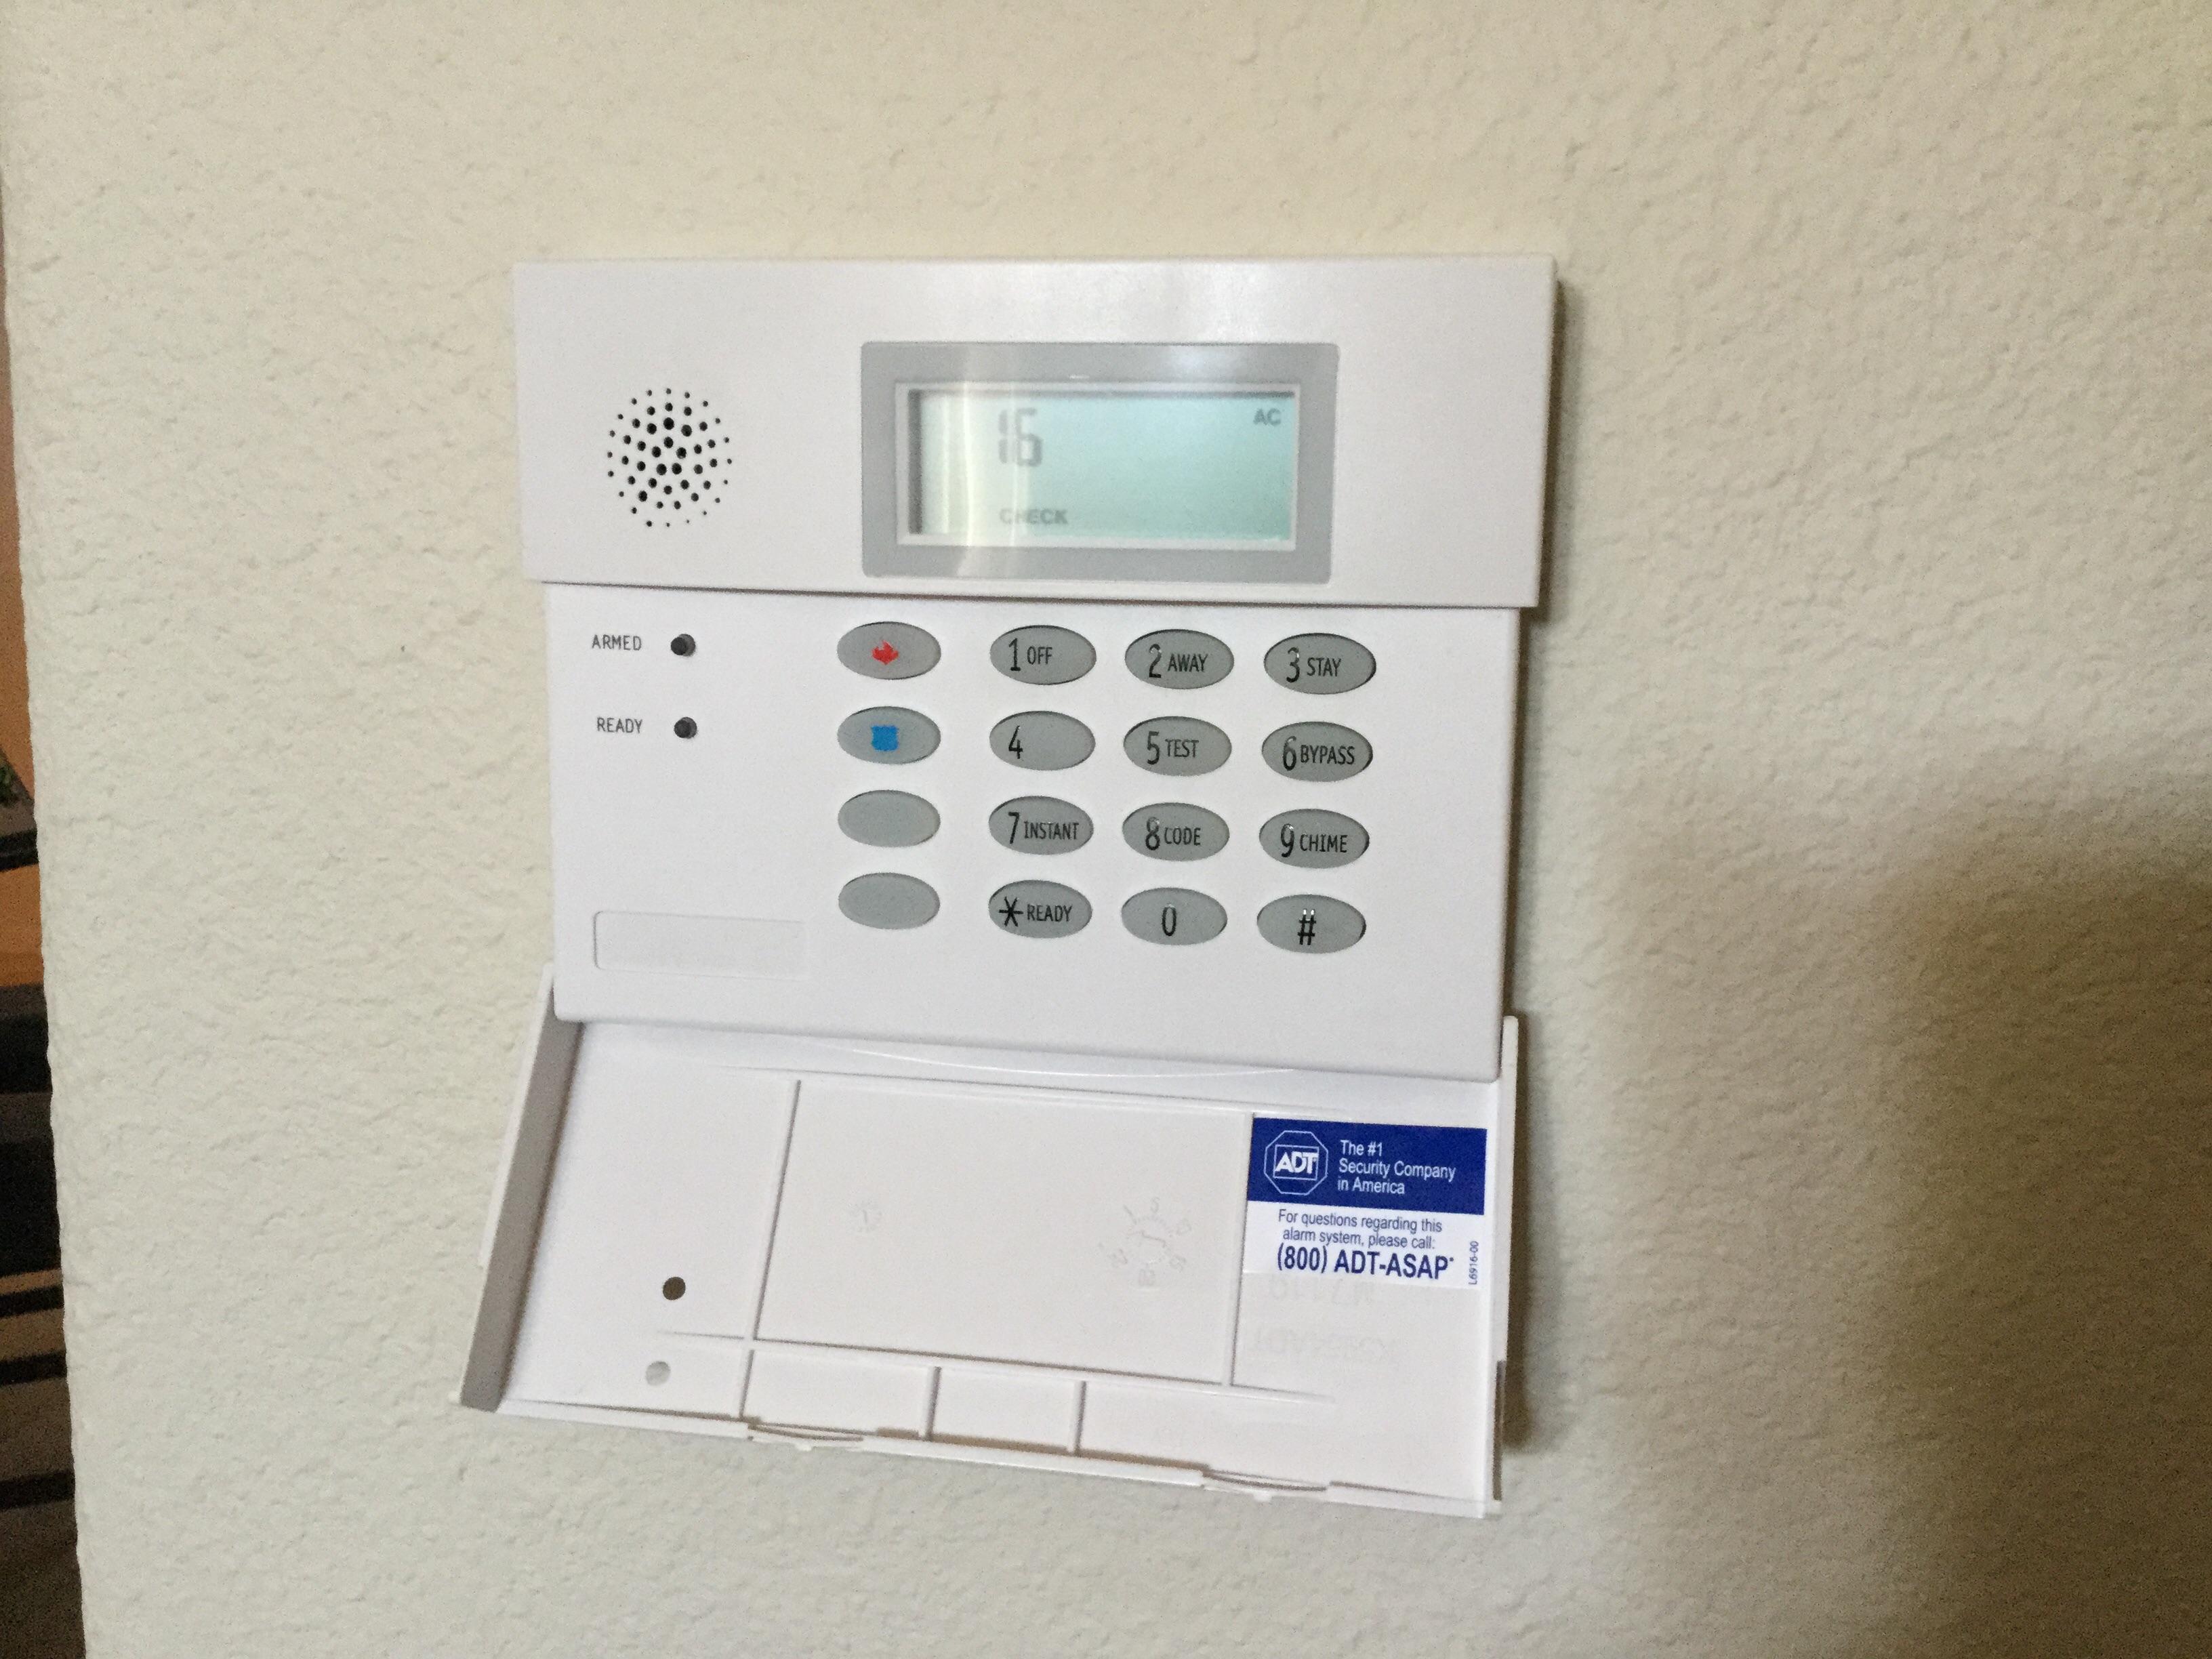 Adt Safewatch Keypad Wiring Diagram | Wiring Diagram Liry on